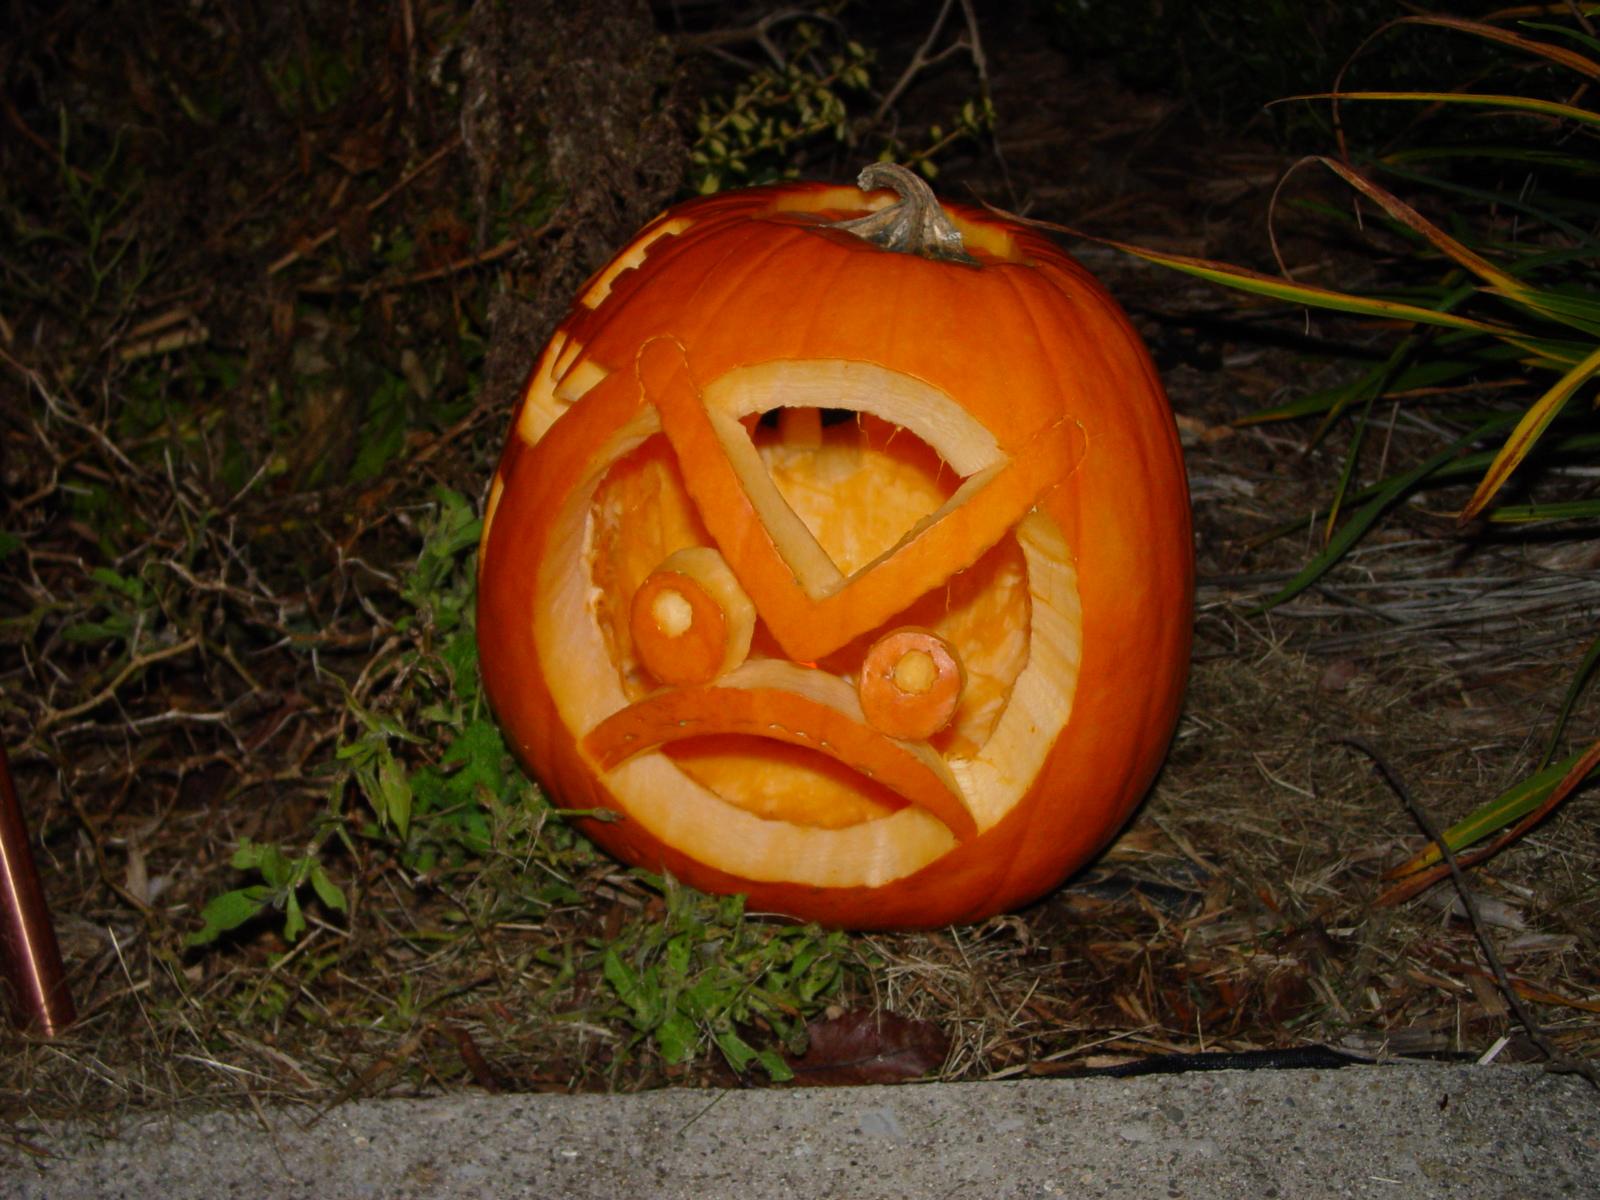 Pumpkin Carving 09 - 1